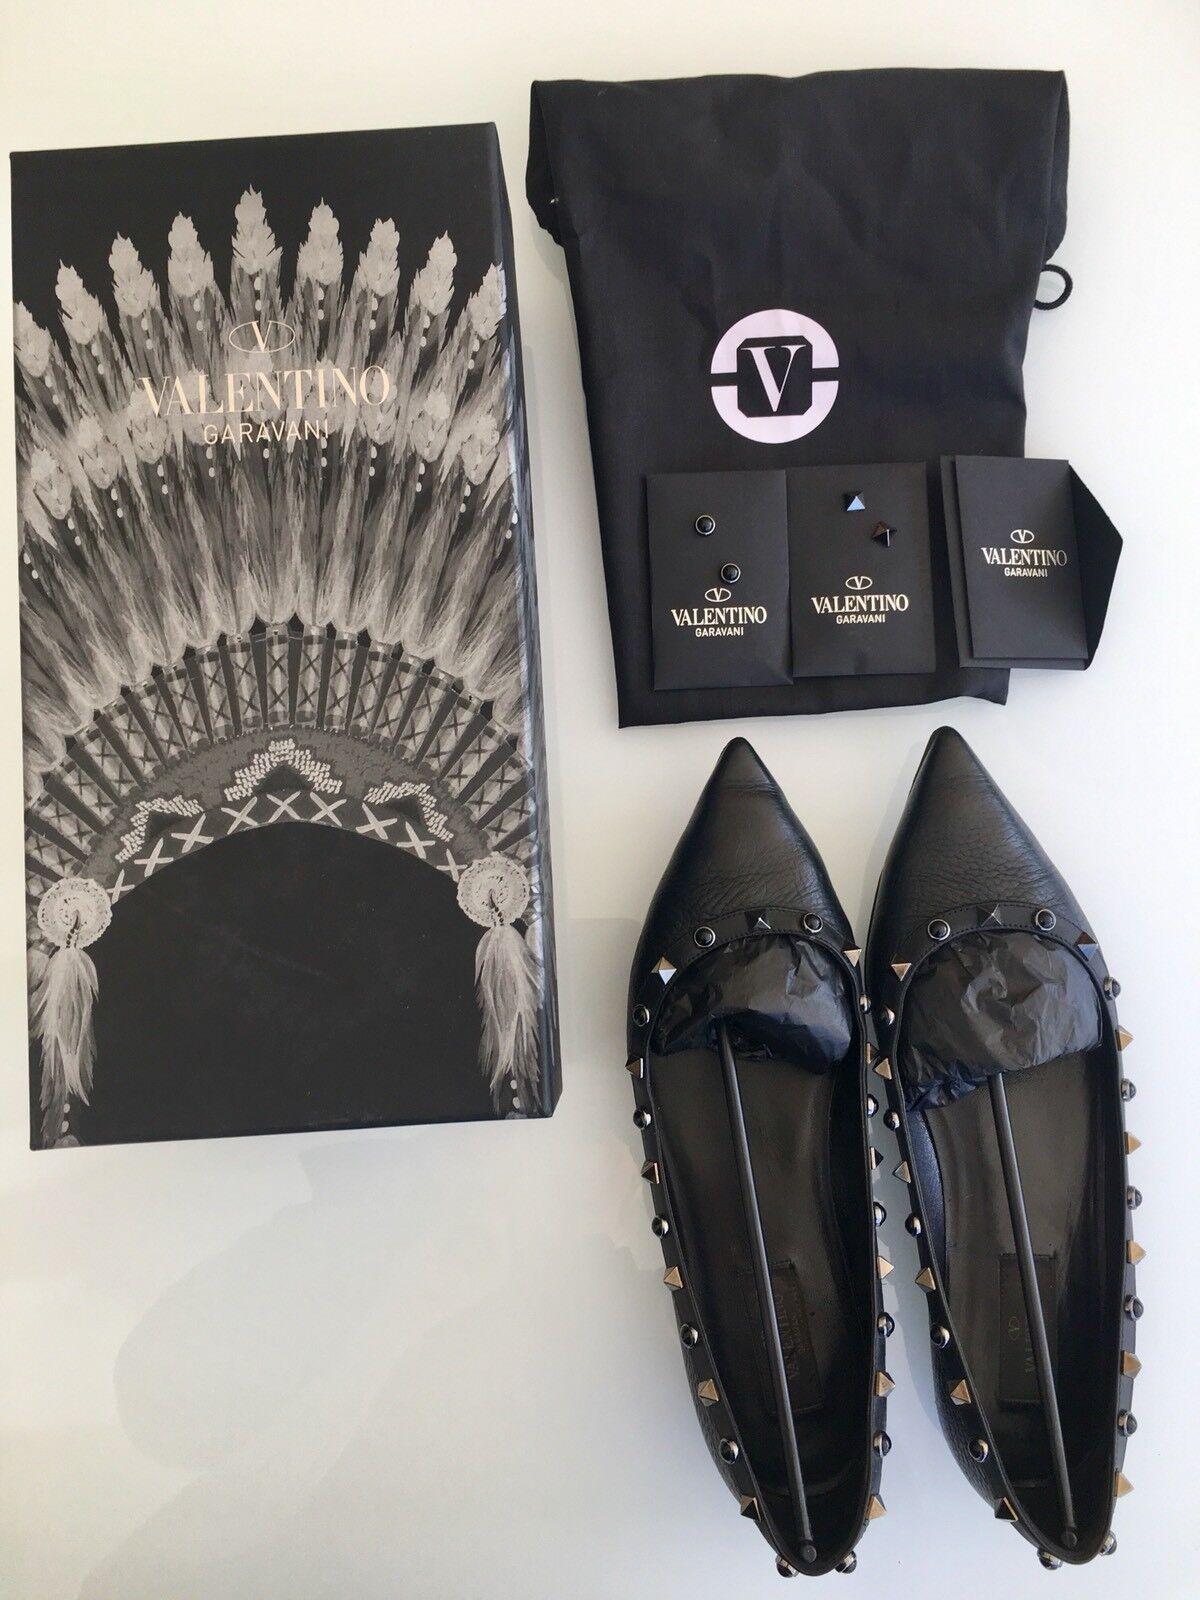 Valentino Rockstud Ballerina Flat Schuhe Gr.39 Schwarz/Nieten Silber